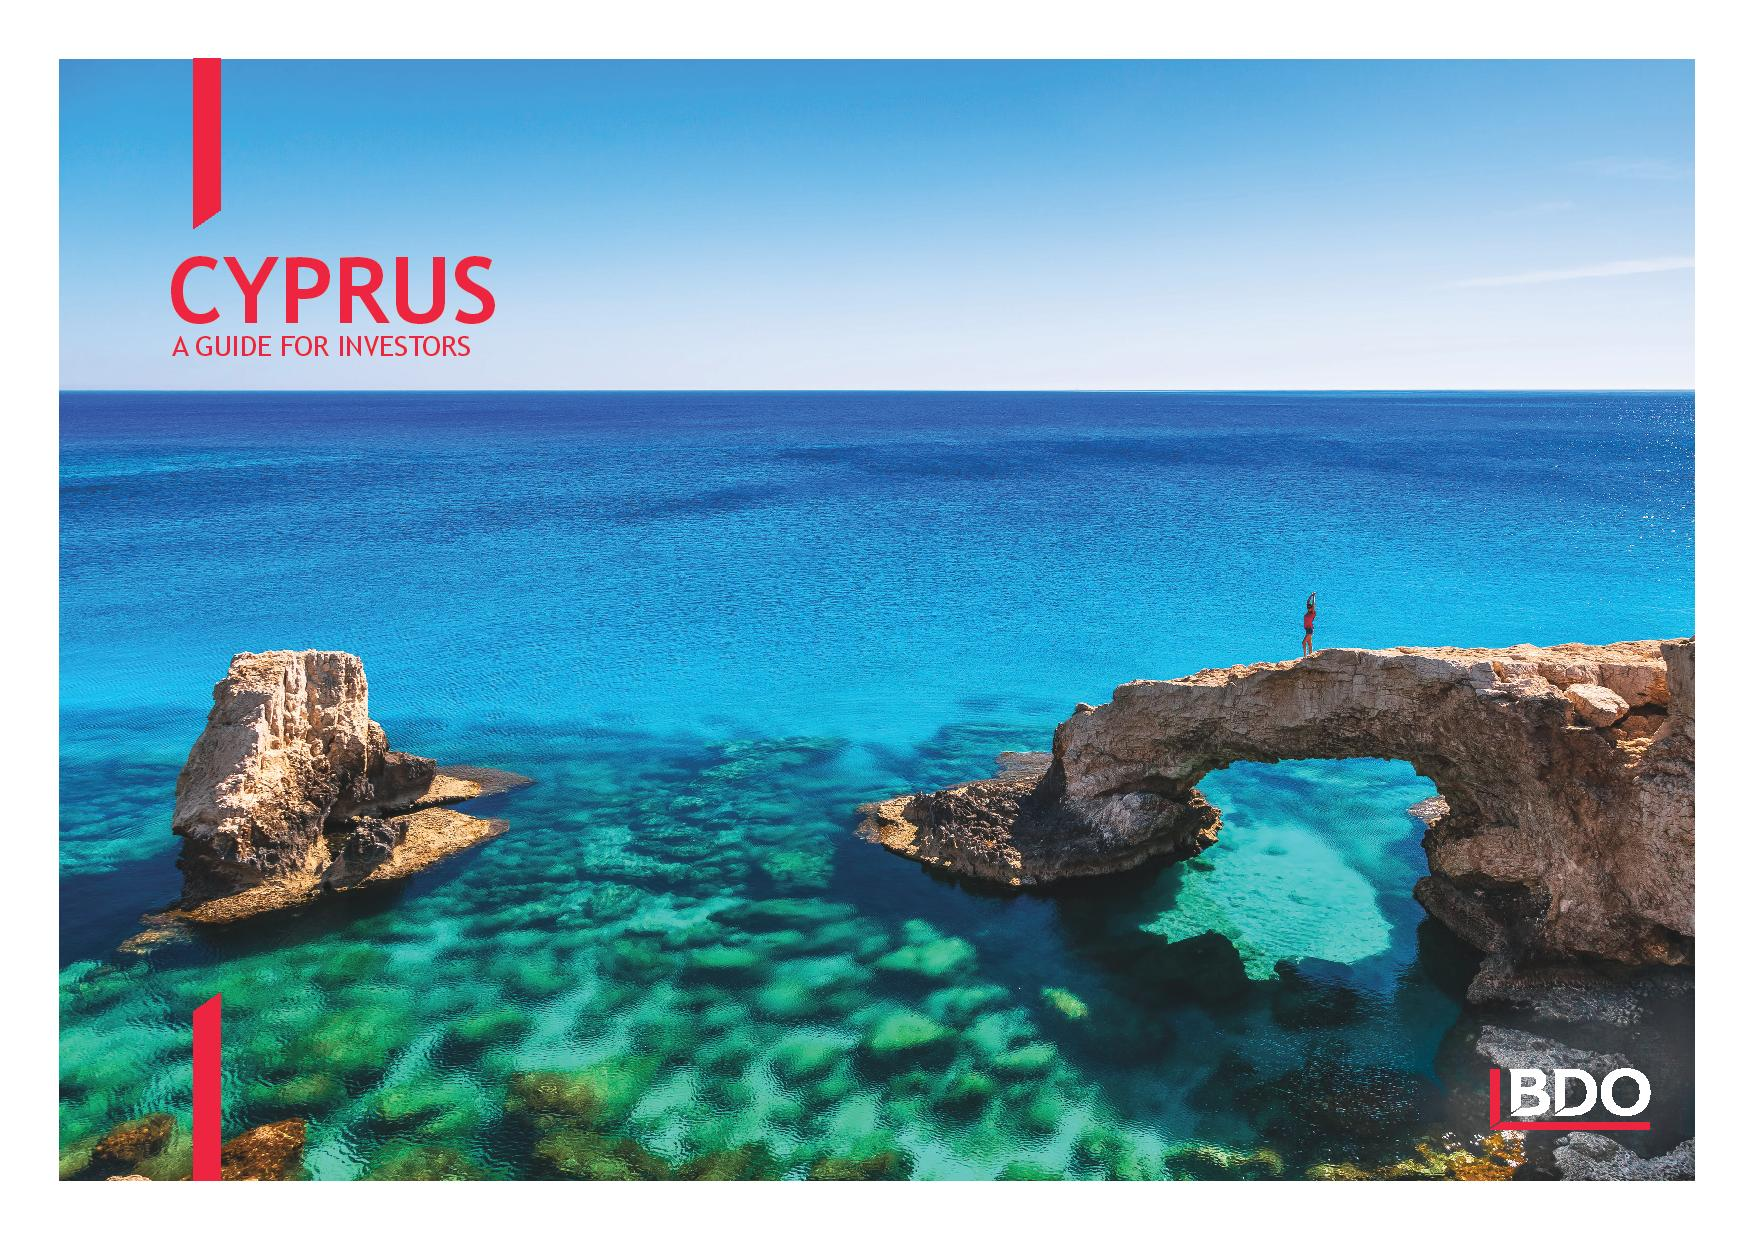 BDO: Cyprus Guide for Investors